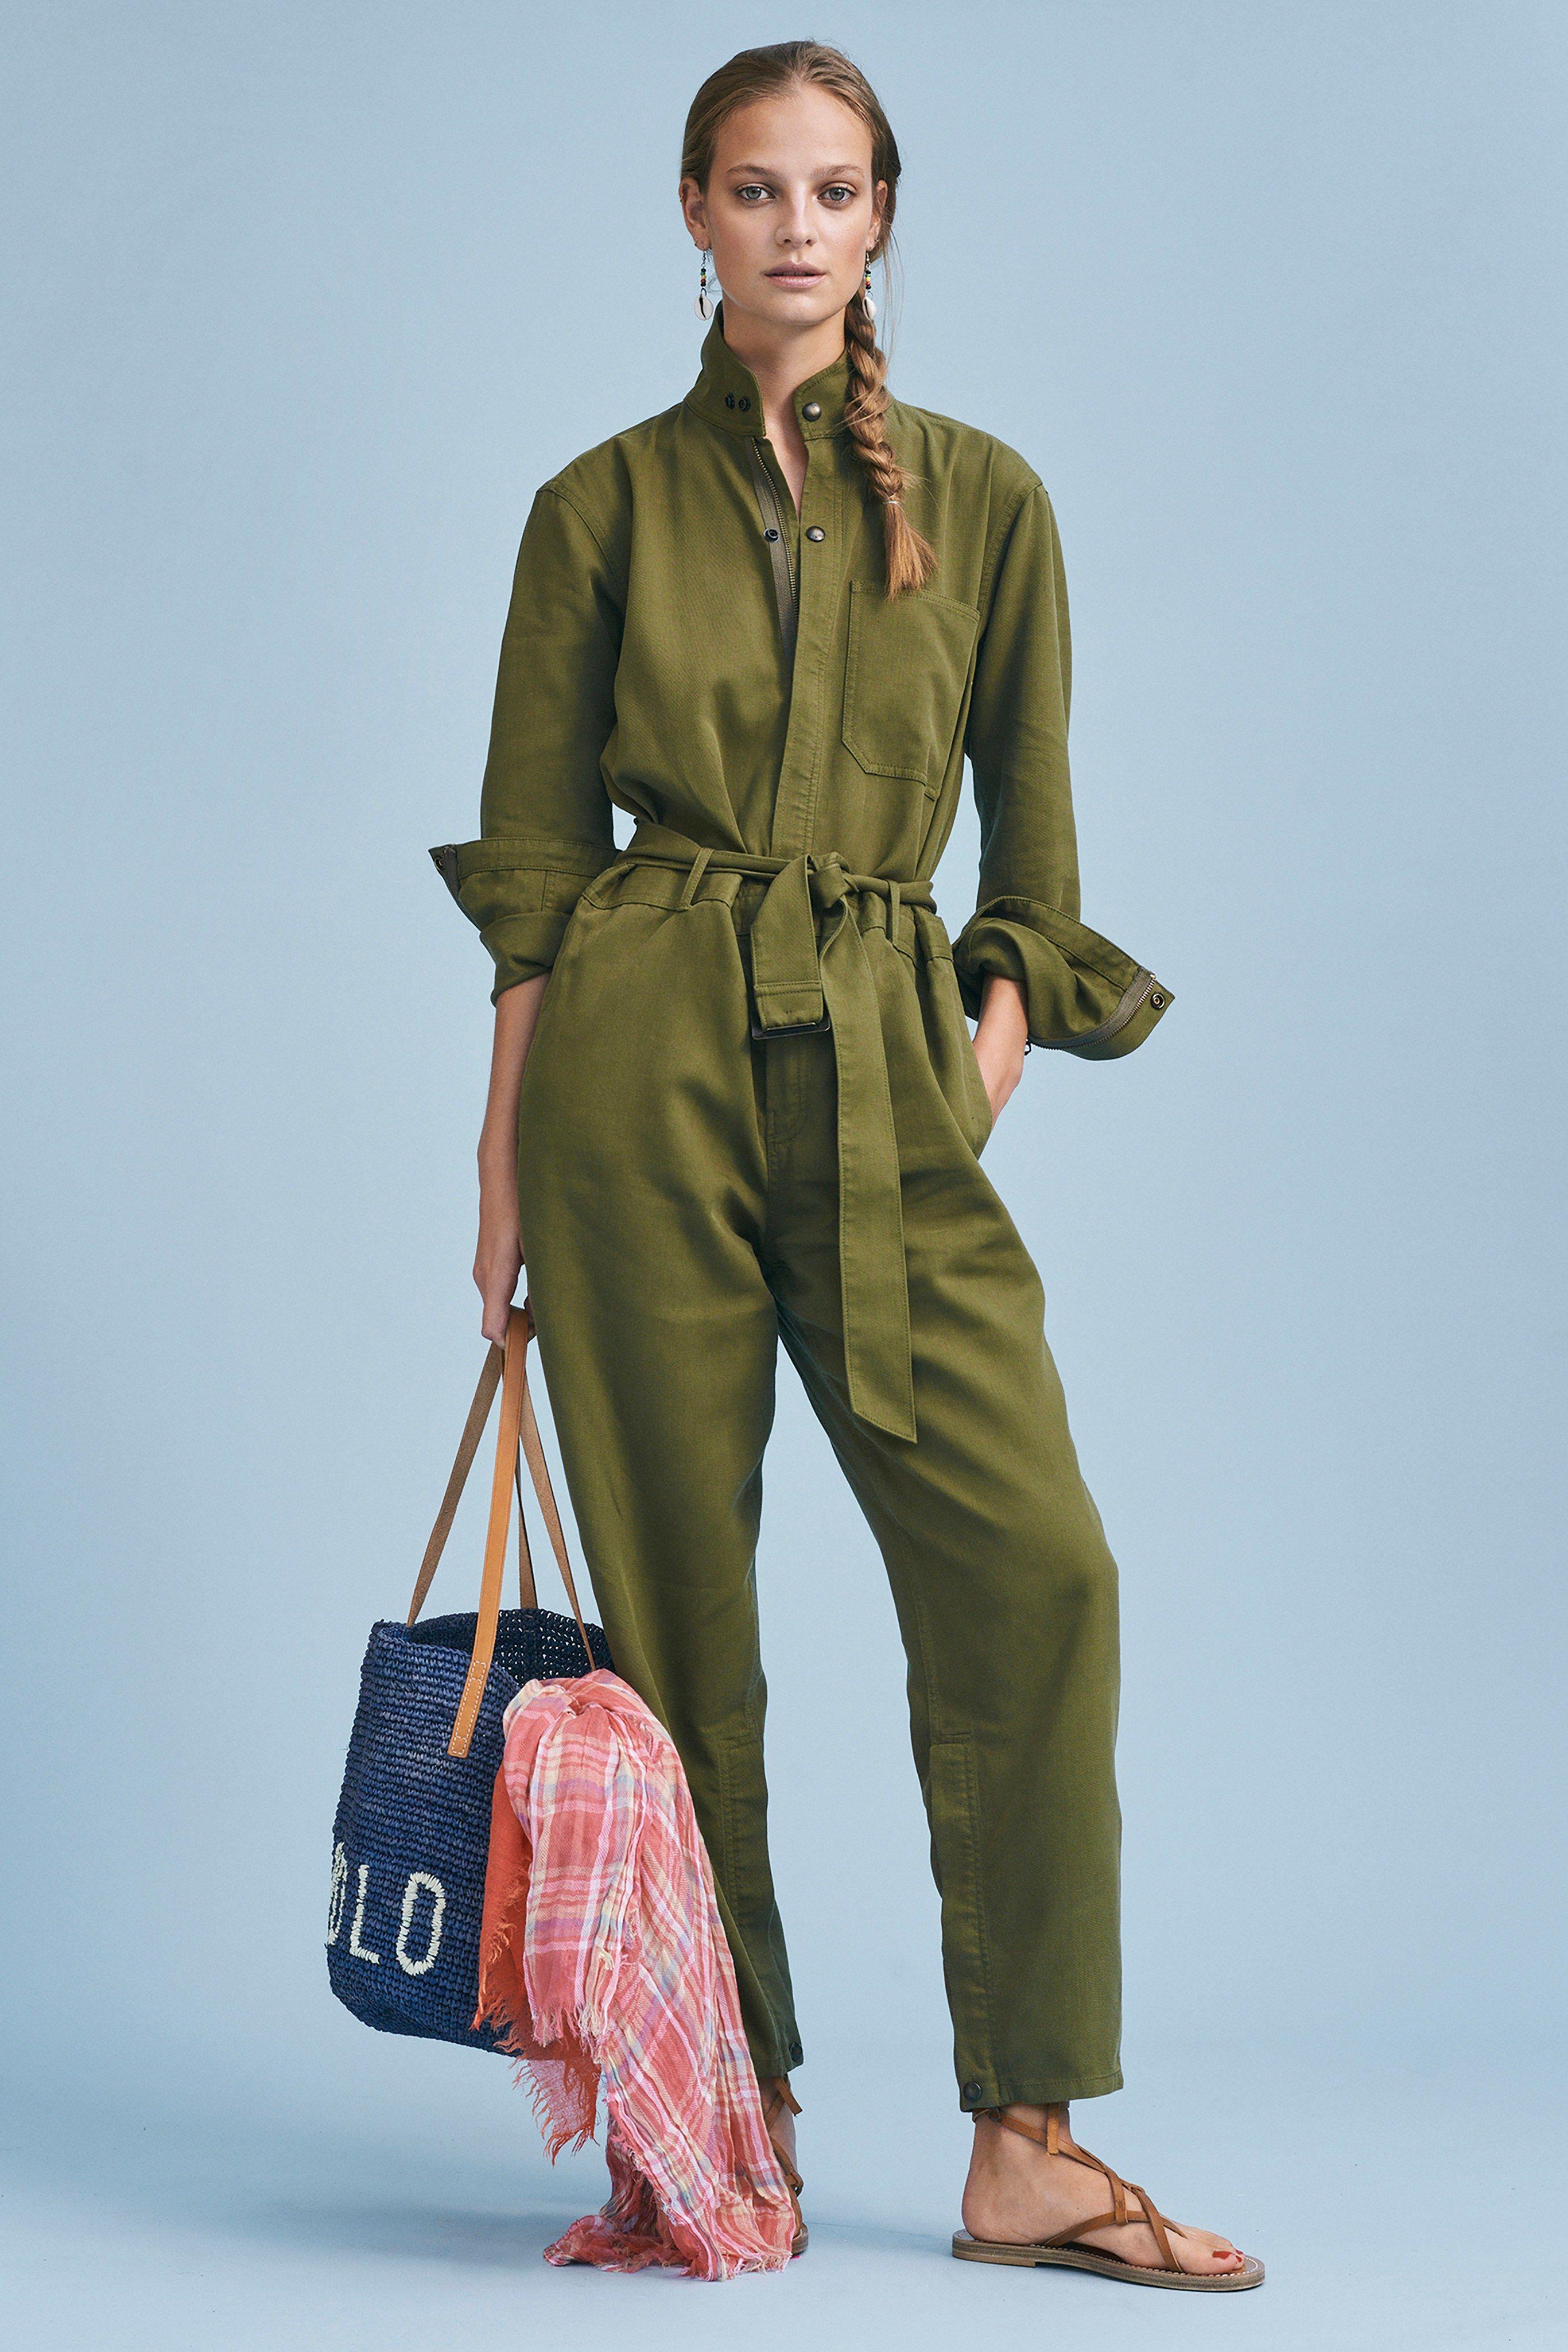 Ready Wear Show In Lauren 2019 Ralph Spring Fashion Polo To Sjc54A3RLq